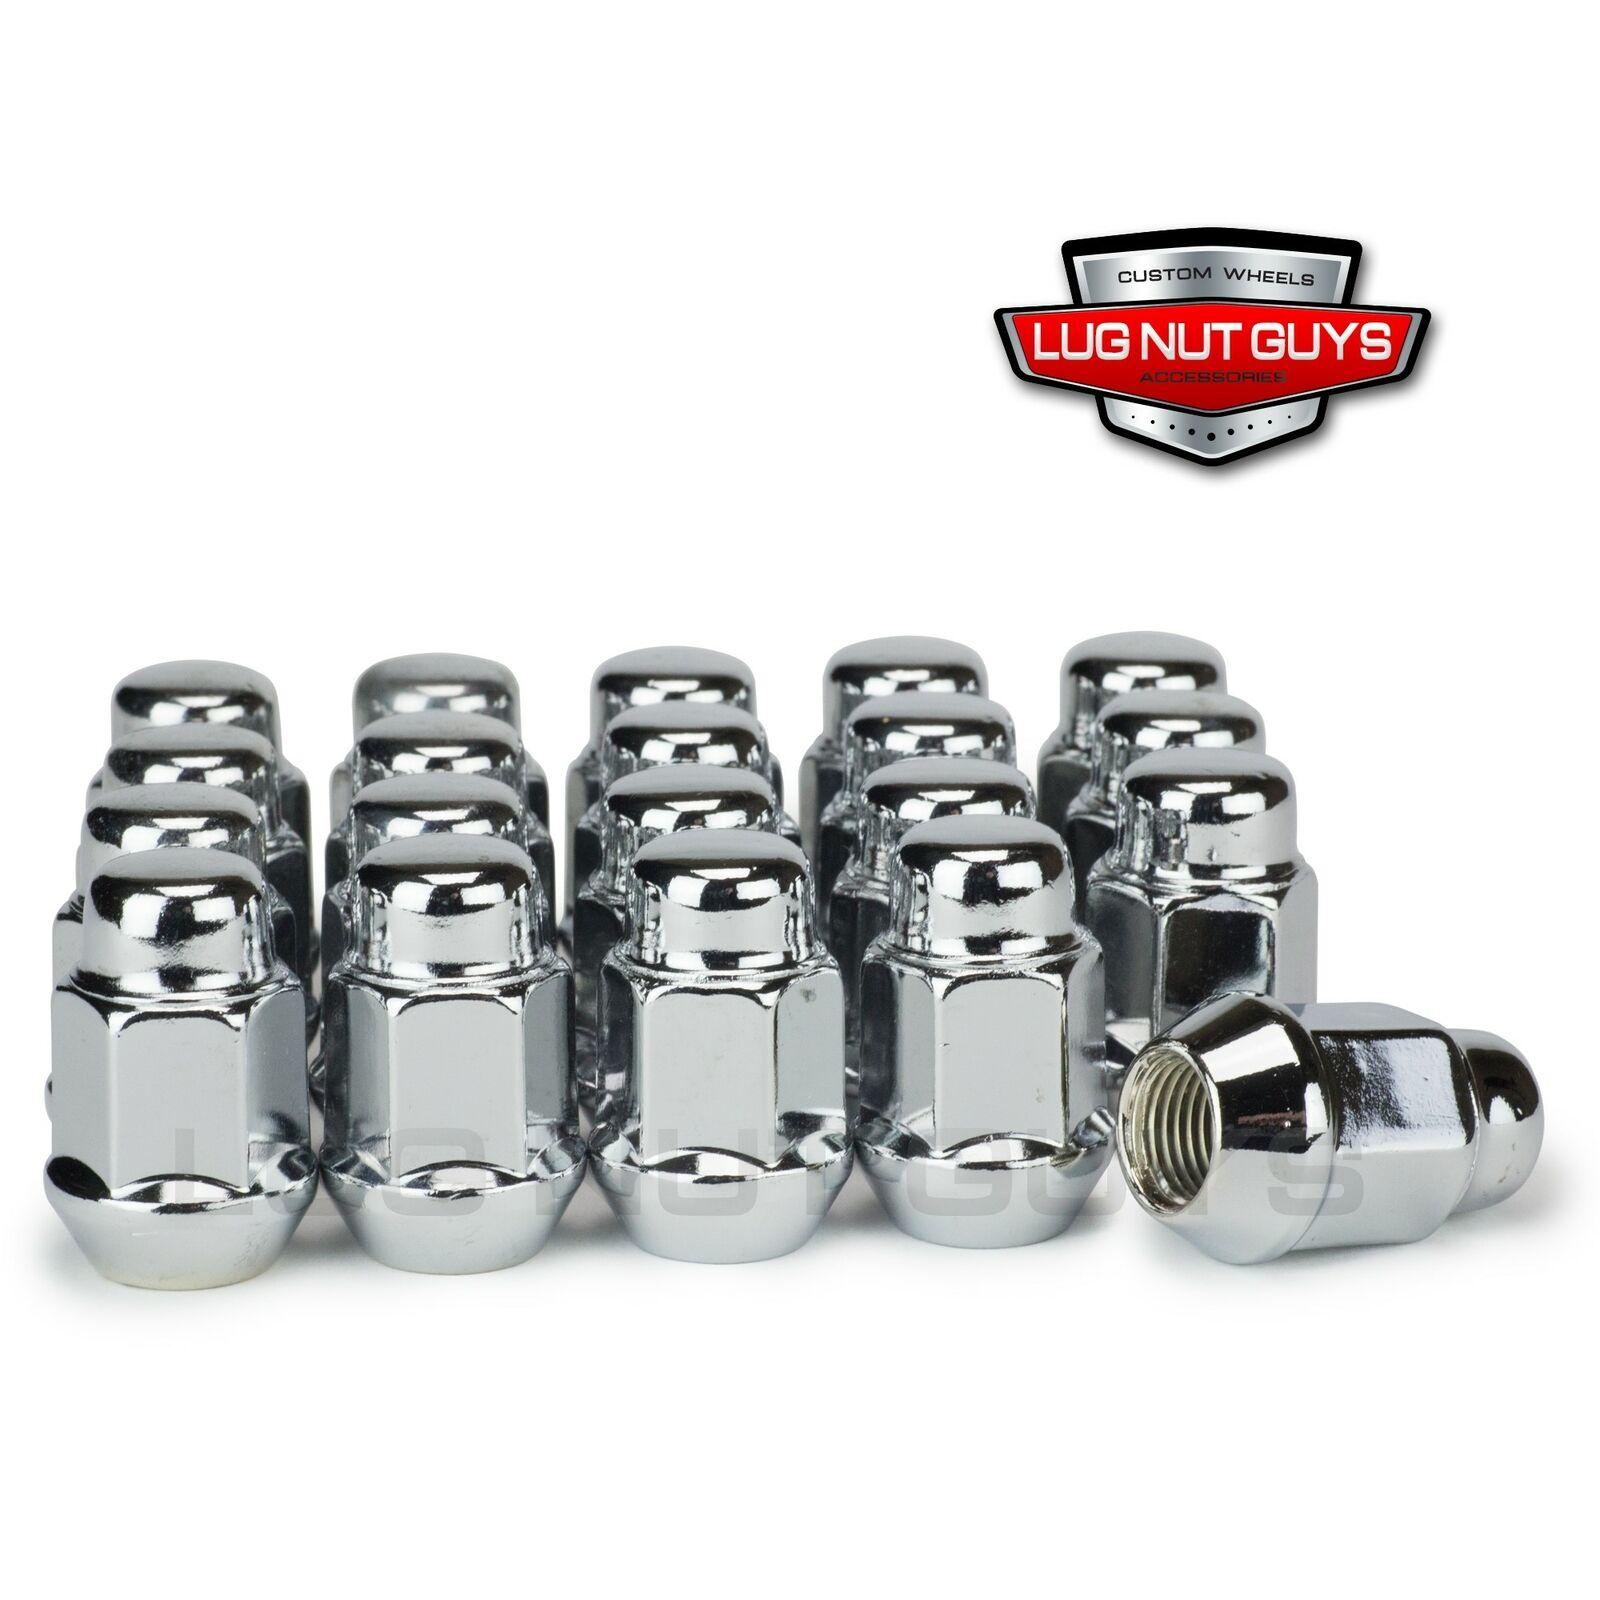 Cone Seat 19mm Hex Wheel Lug Nut Wheel Accessories Parts 20 Dual Coating Chrome 12x1.5 Closed End Bulge Acorn Lug Nuts